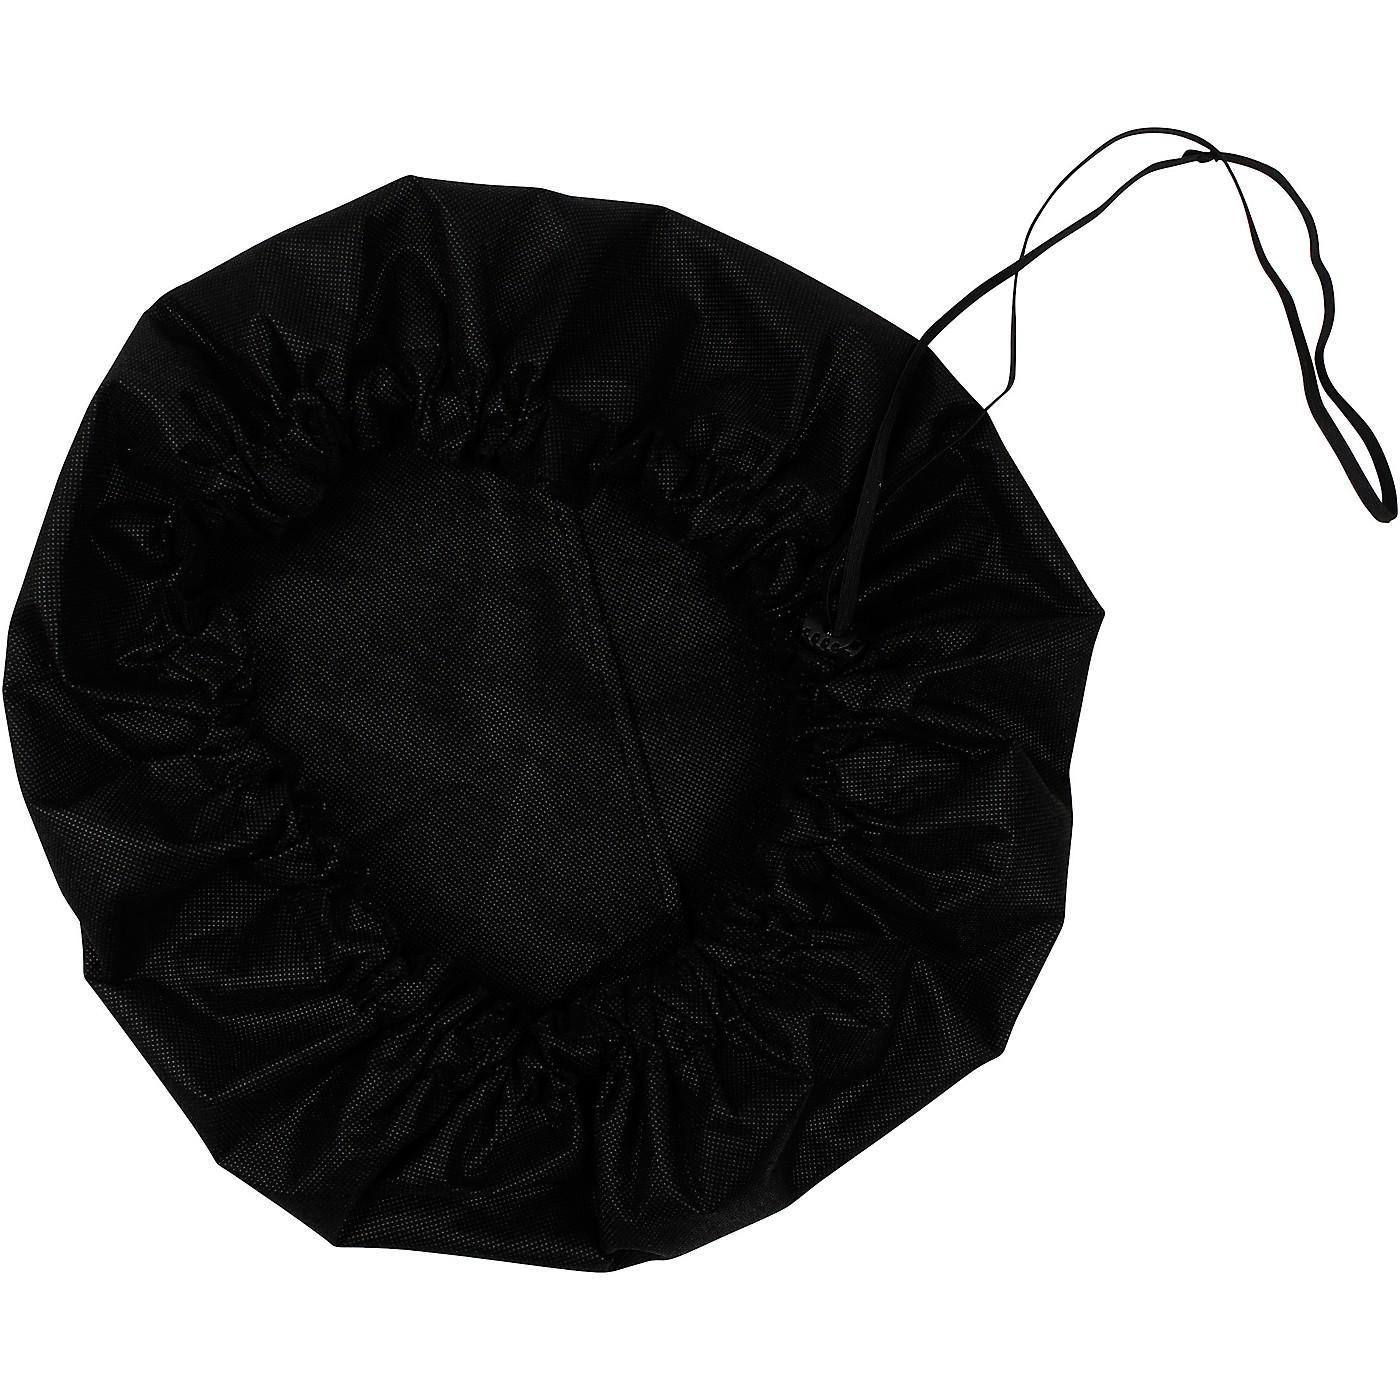 Gator Black Bell Mask With MERV 13 Filter, 22-23